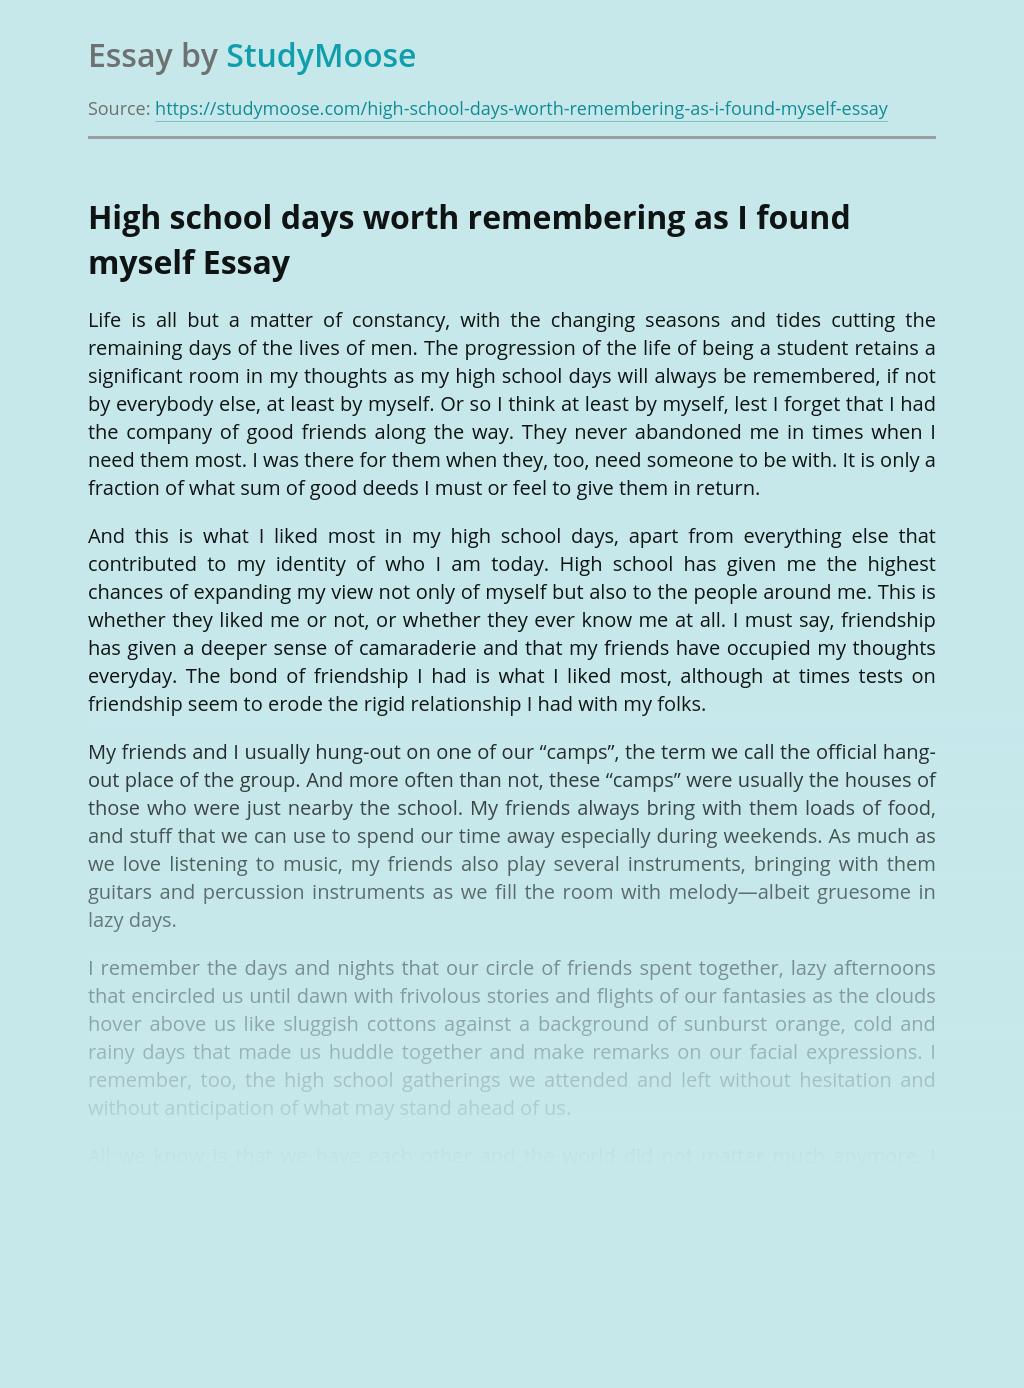 High school days worth remembering as I found myself